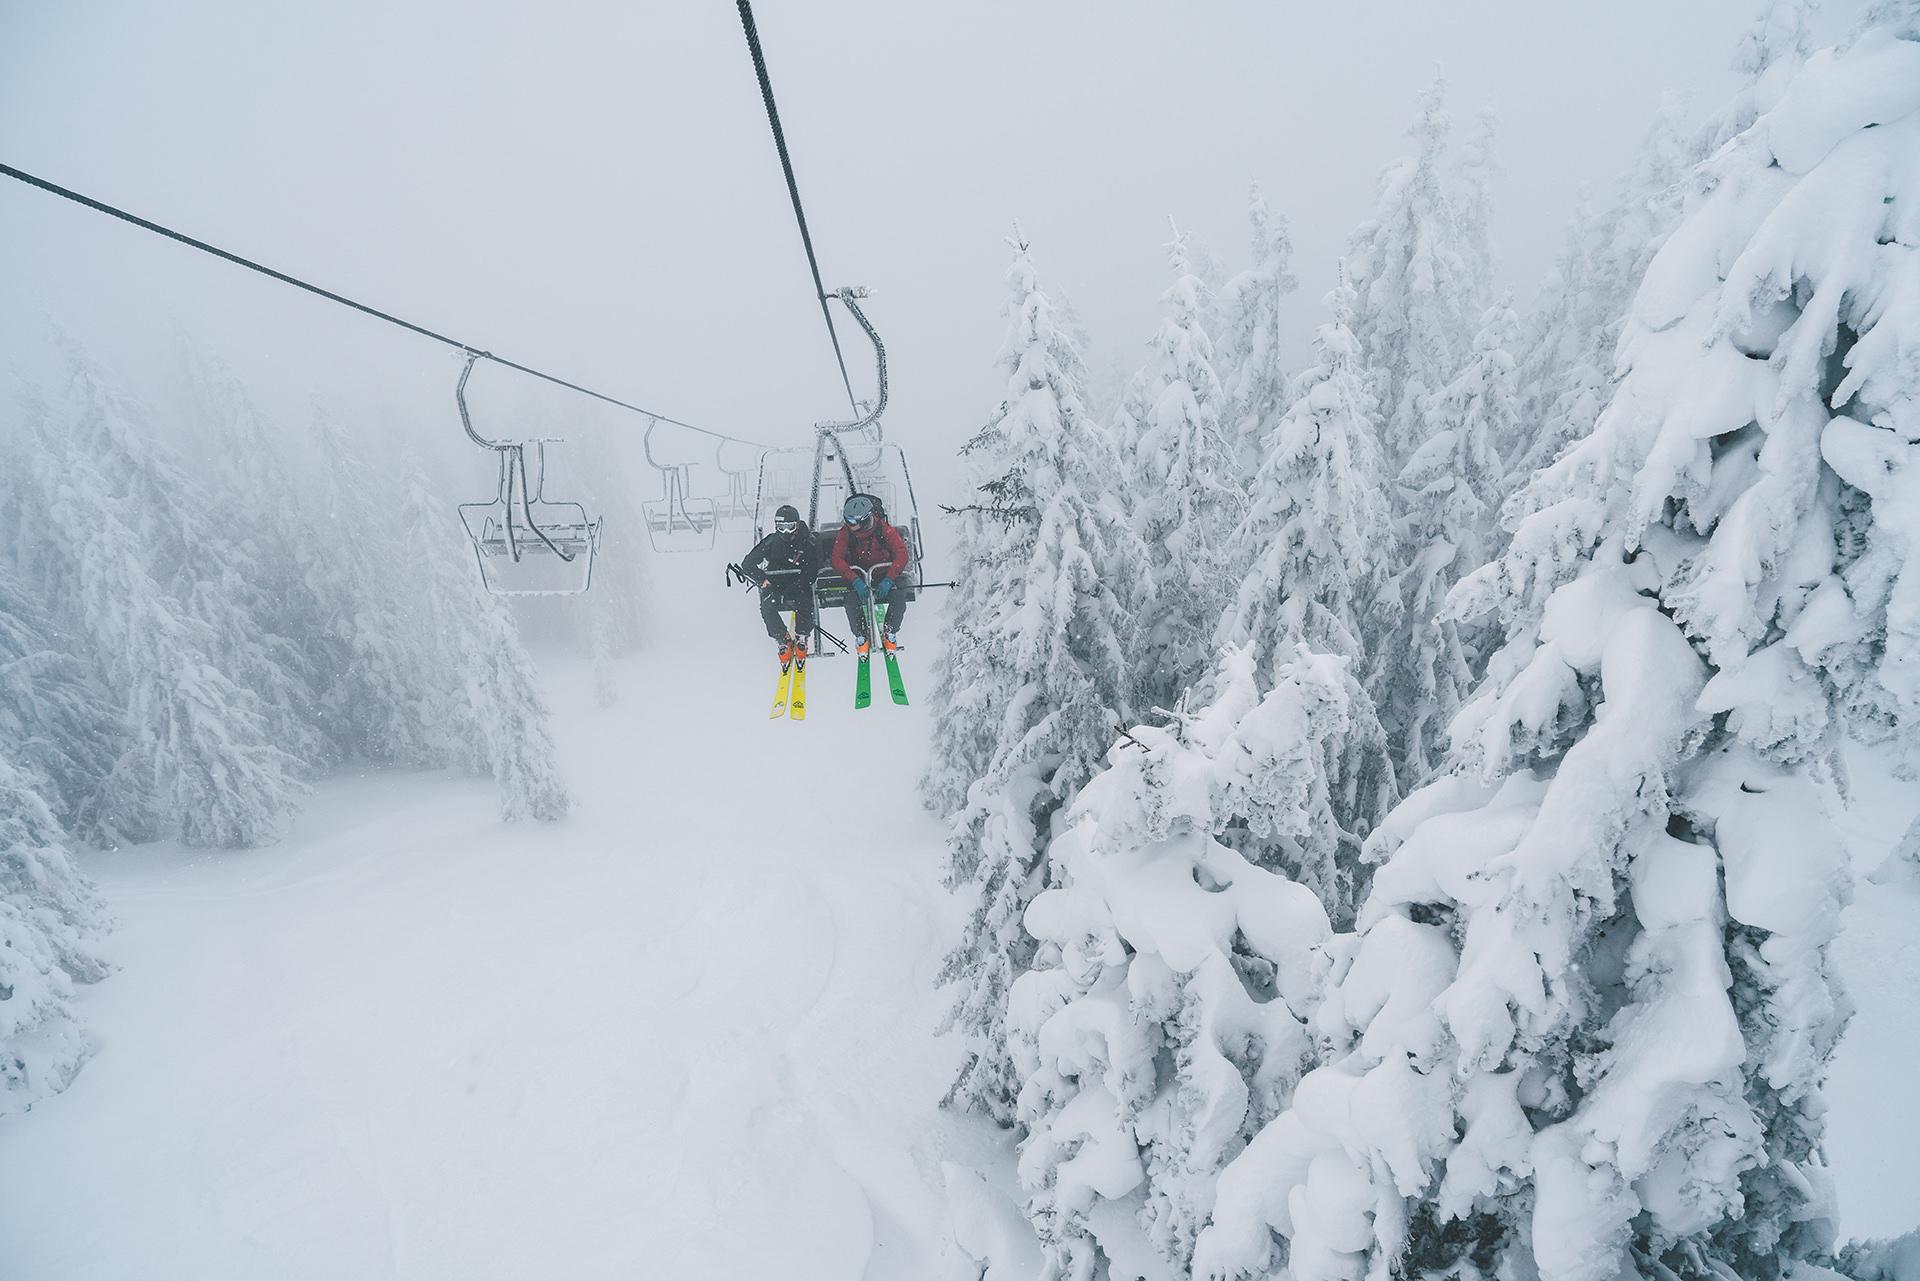 sessellift-nebel-skifahren-schnee